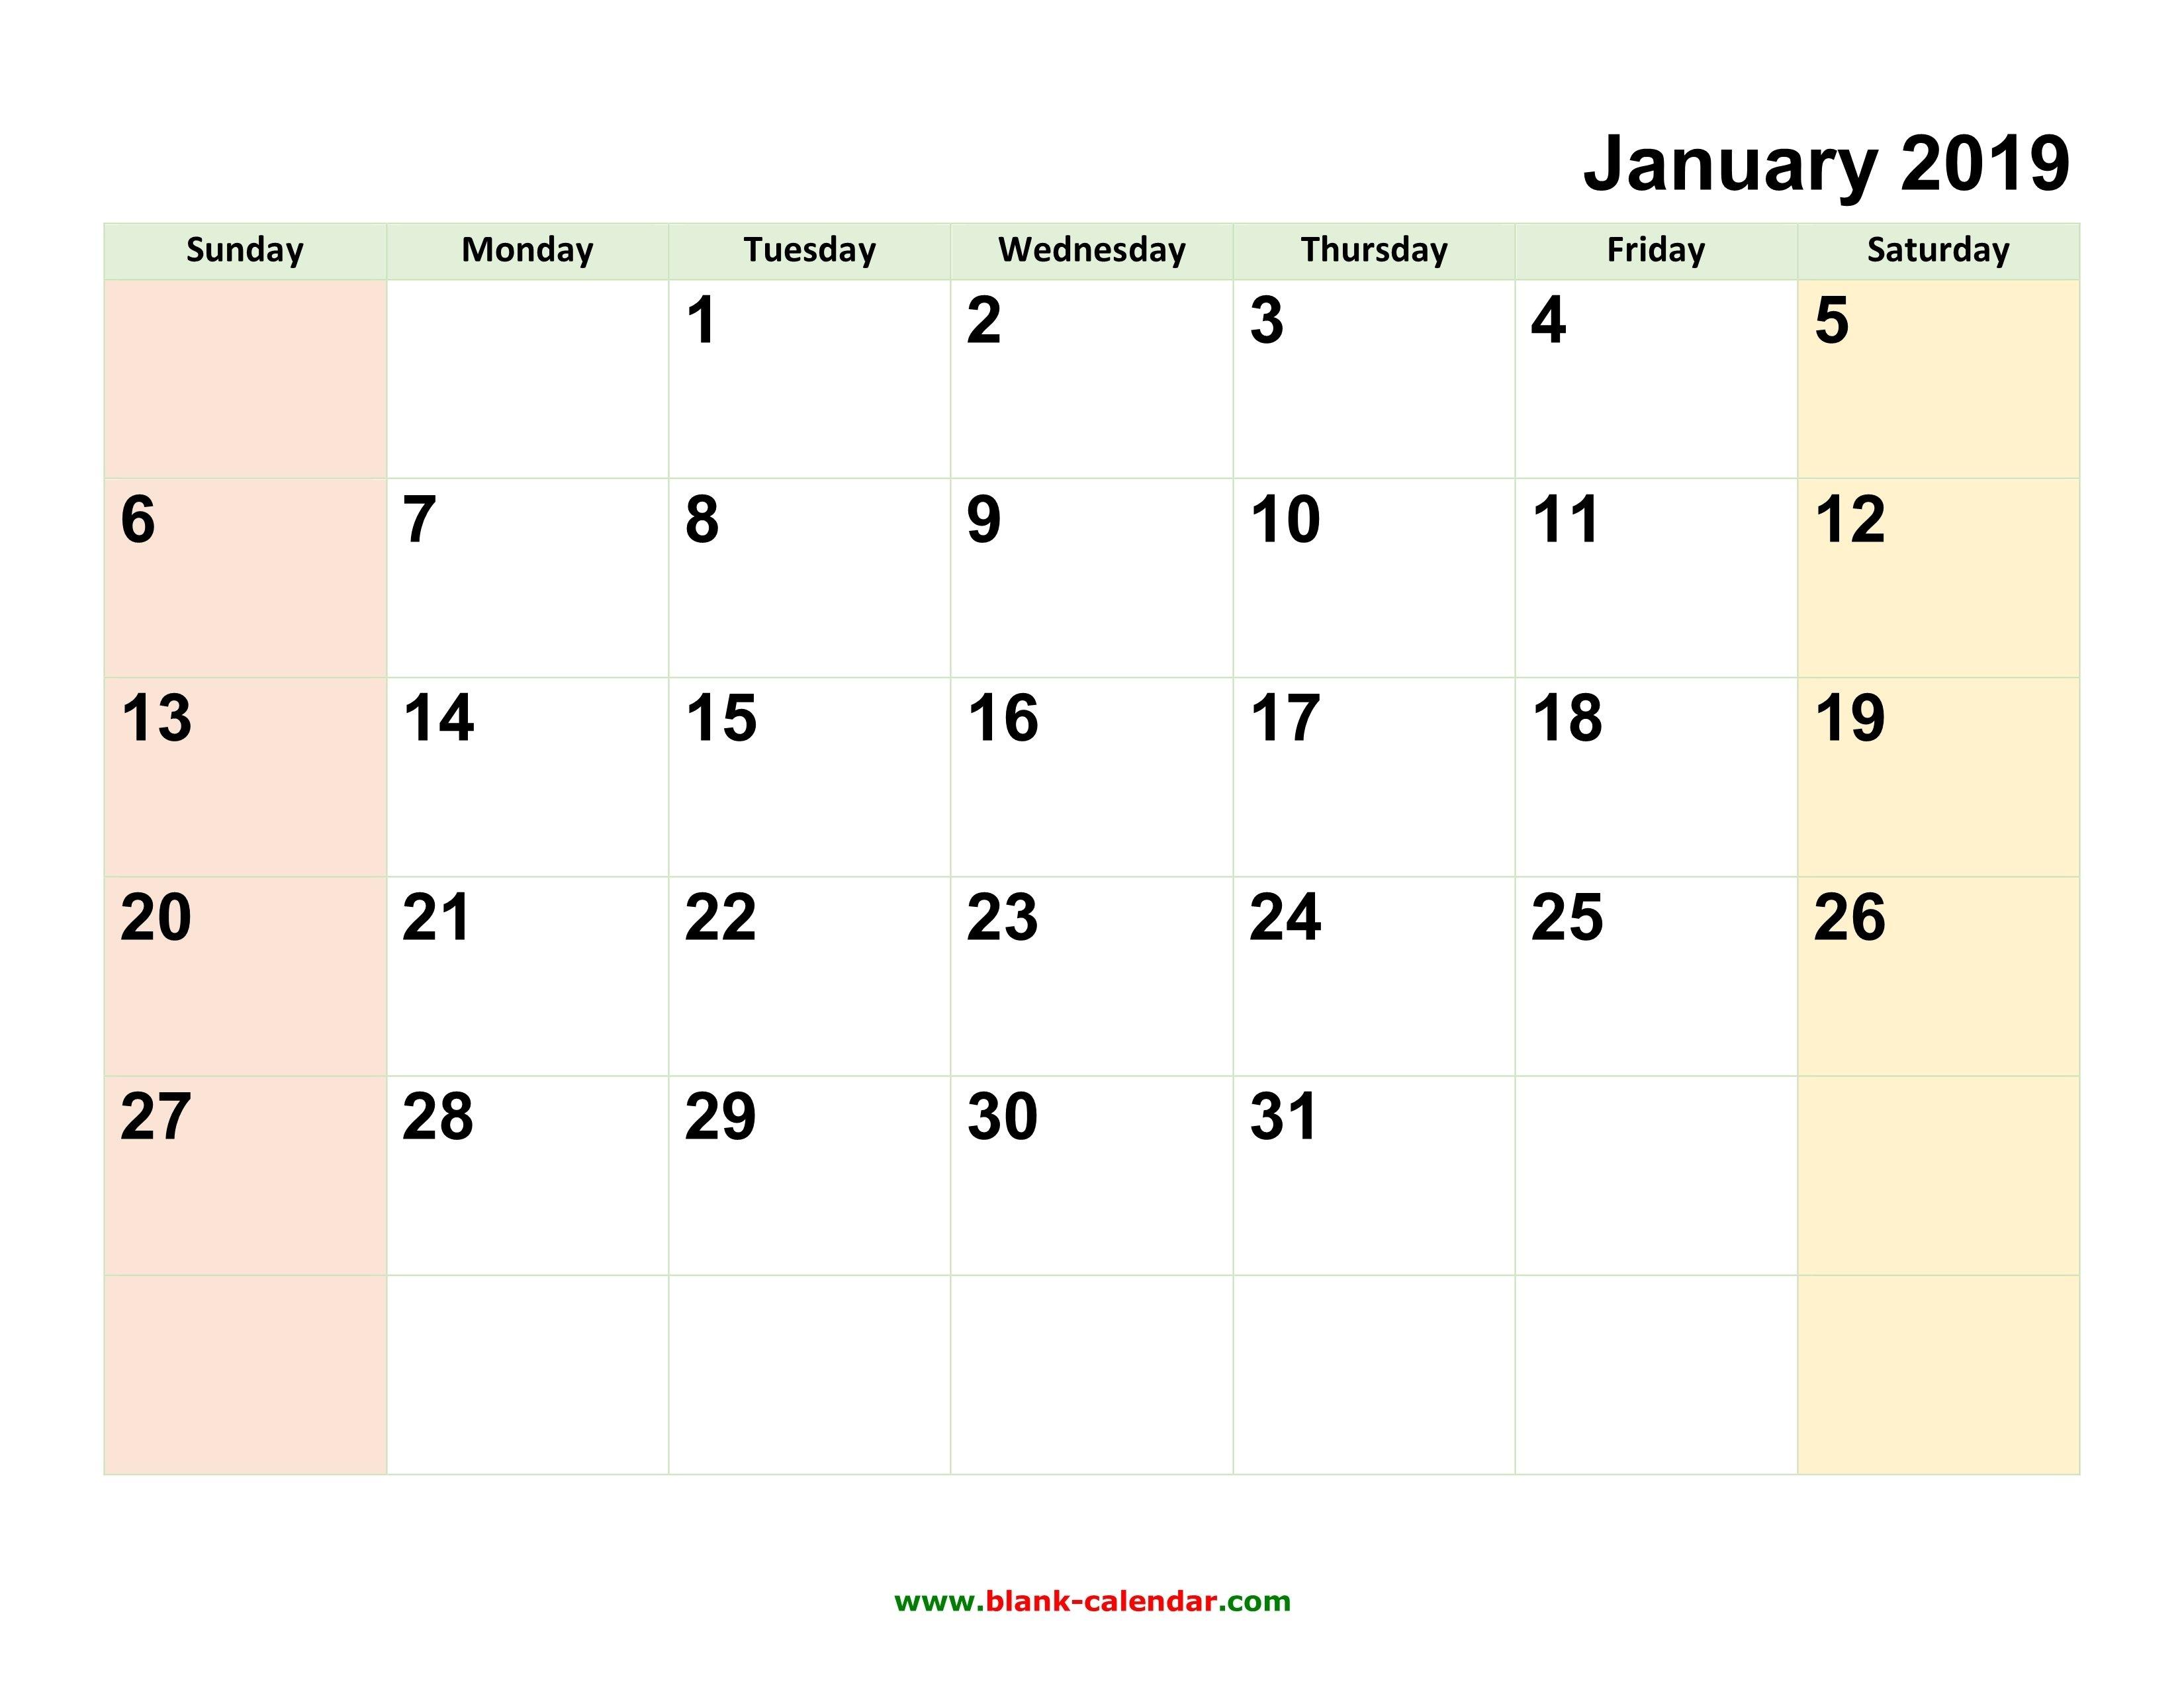 Free Fill In Calendar Templates Month | Calendar Printing Example Calendar 2019 Fill In